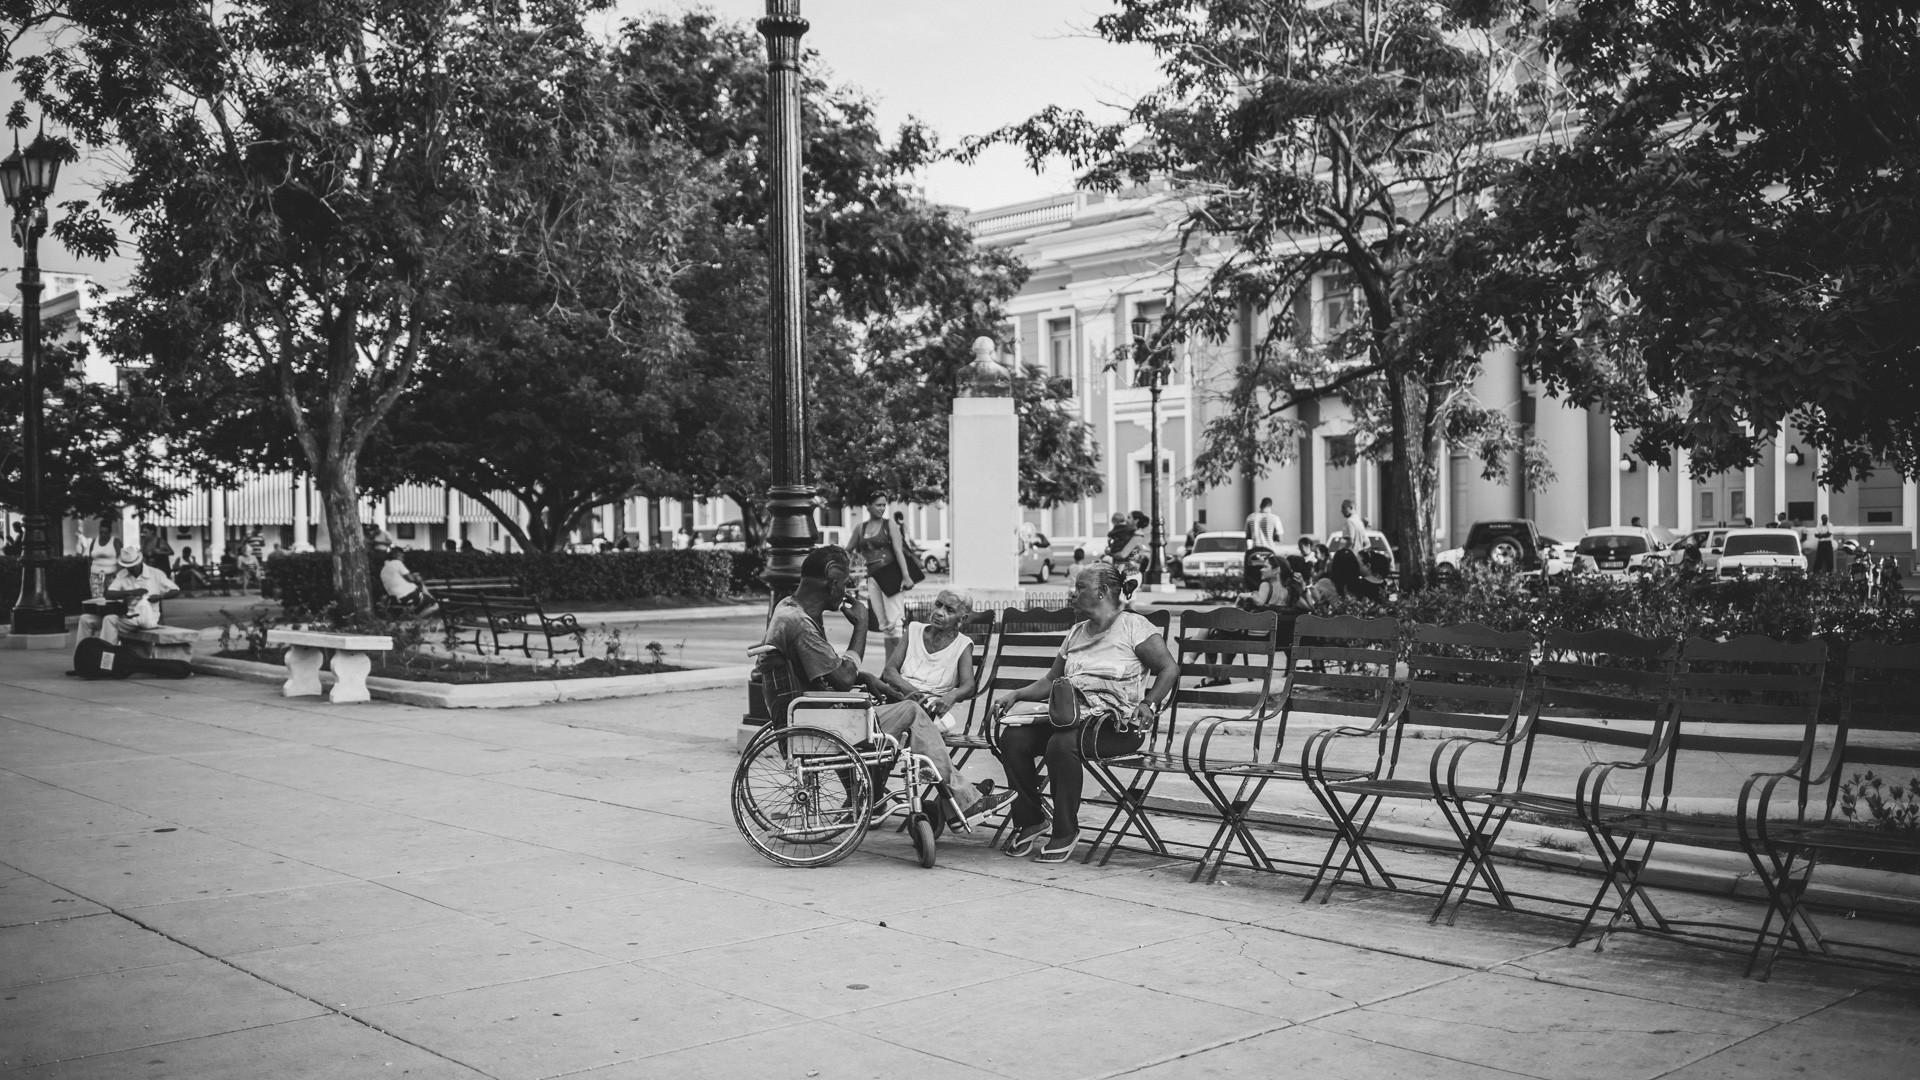 Damien-Dohmen-Photographe-Cuba-45